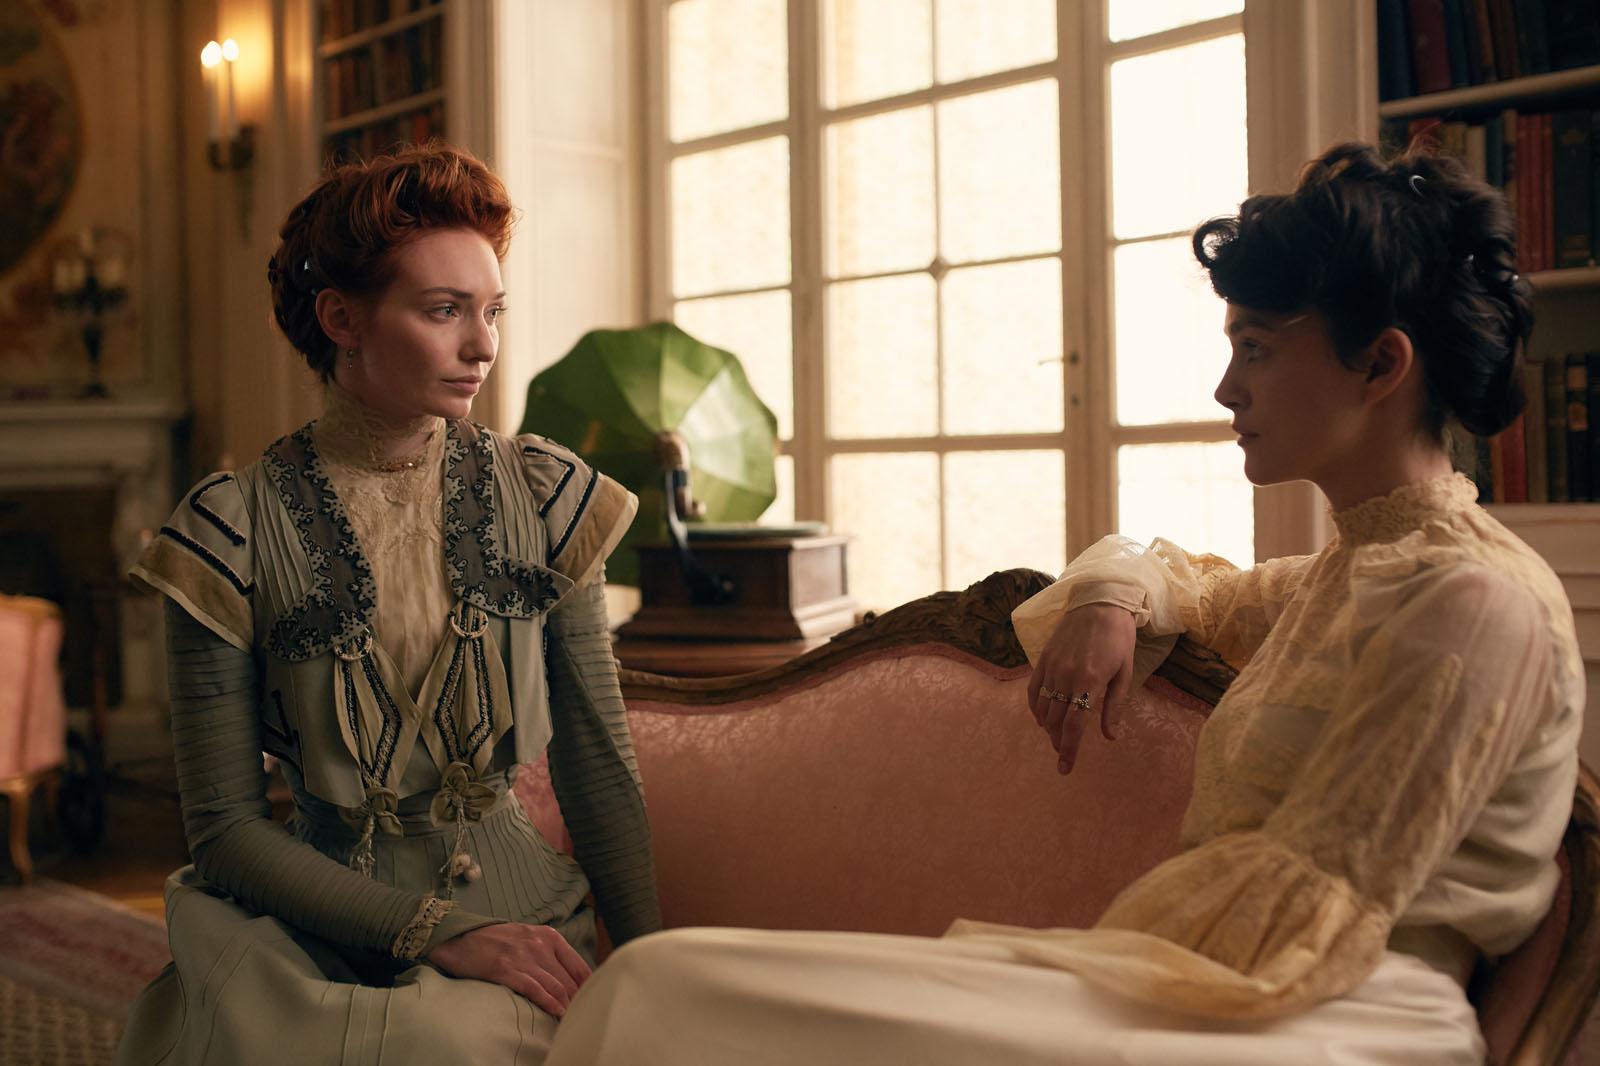 Colette film critique cinema avis Photo Eleanor Tomlinson Keira Knightley